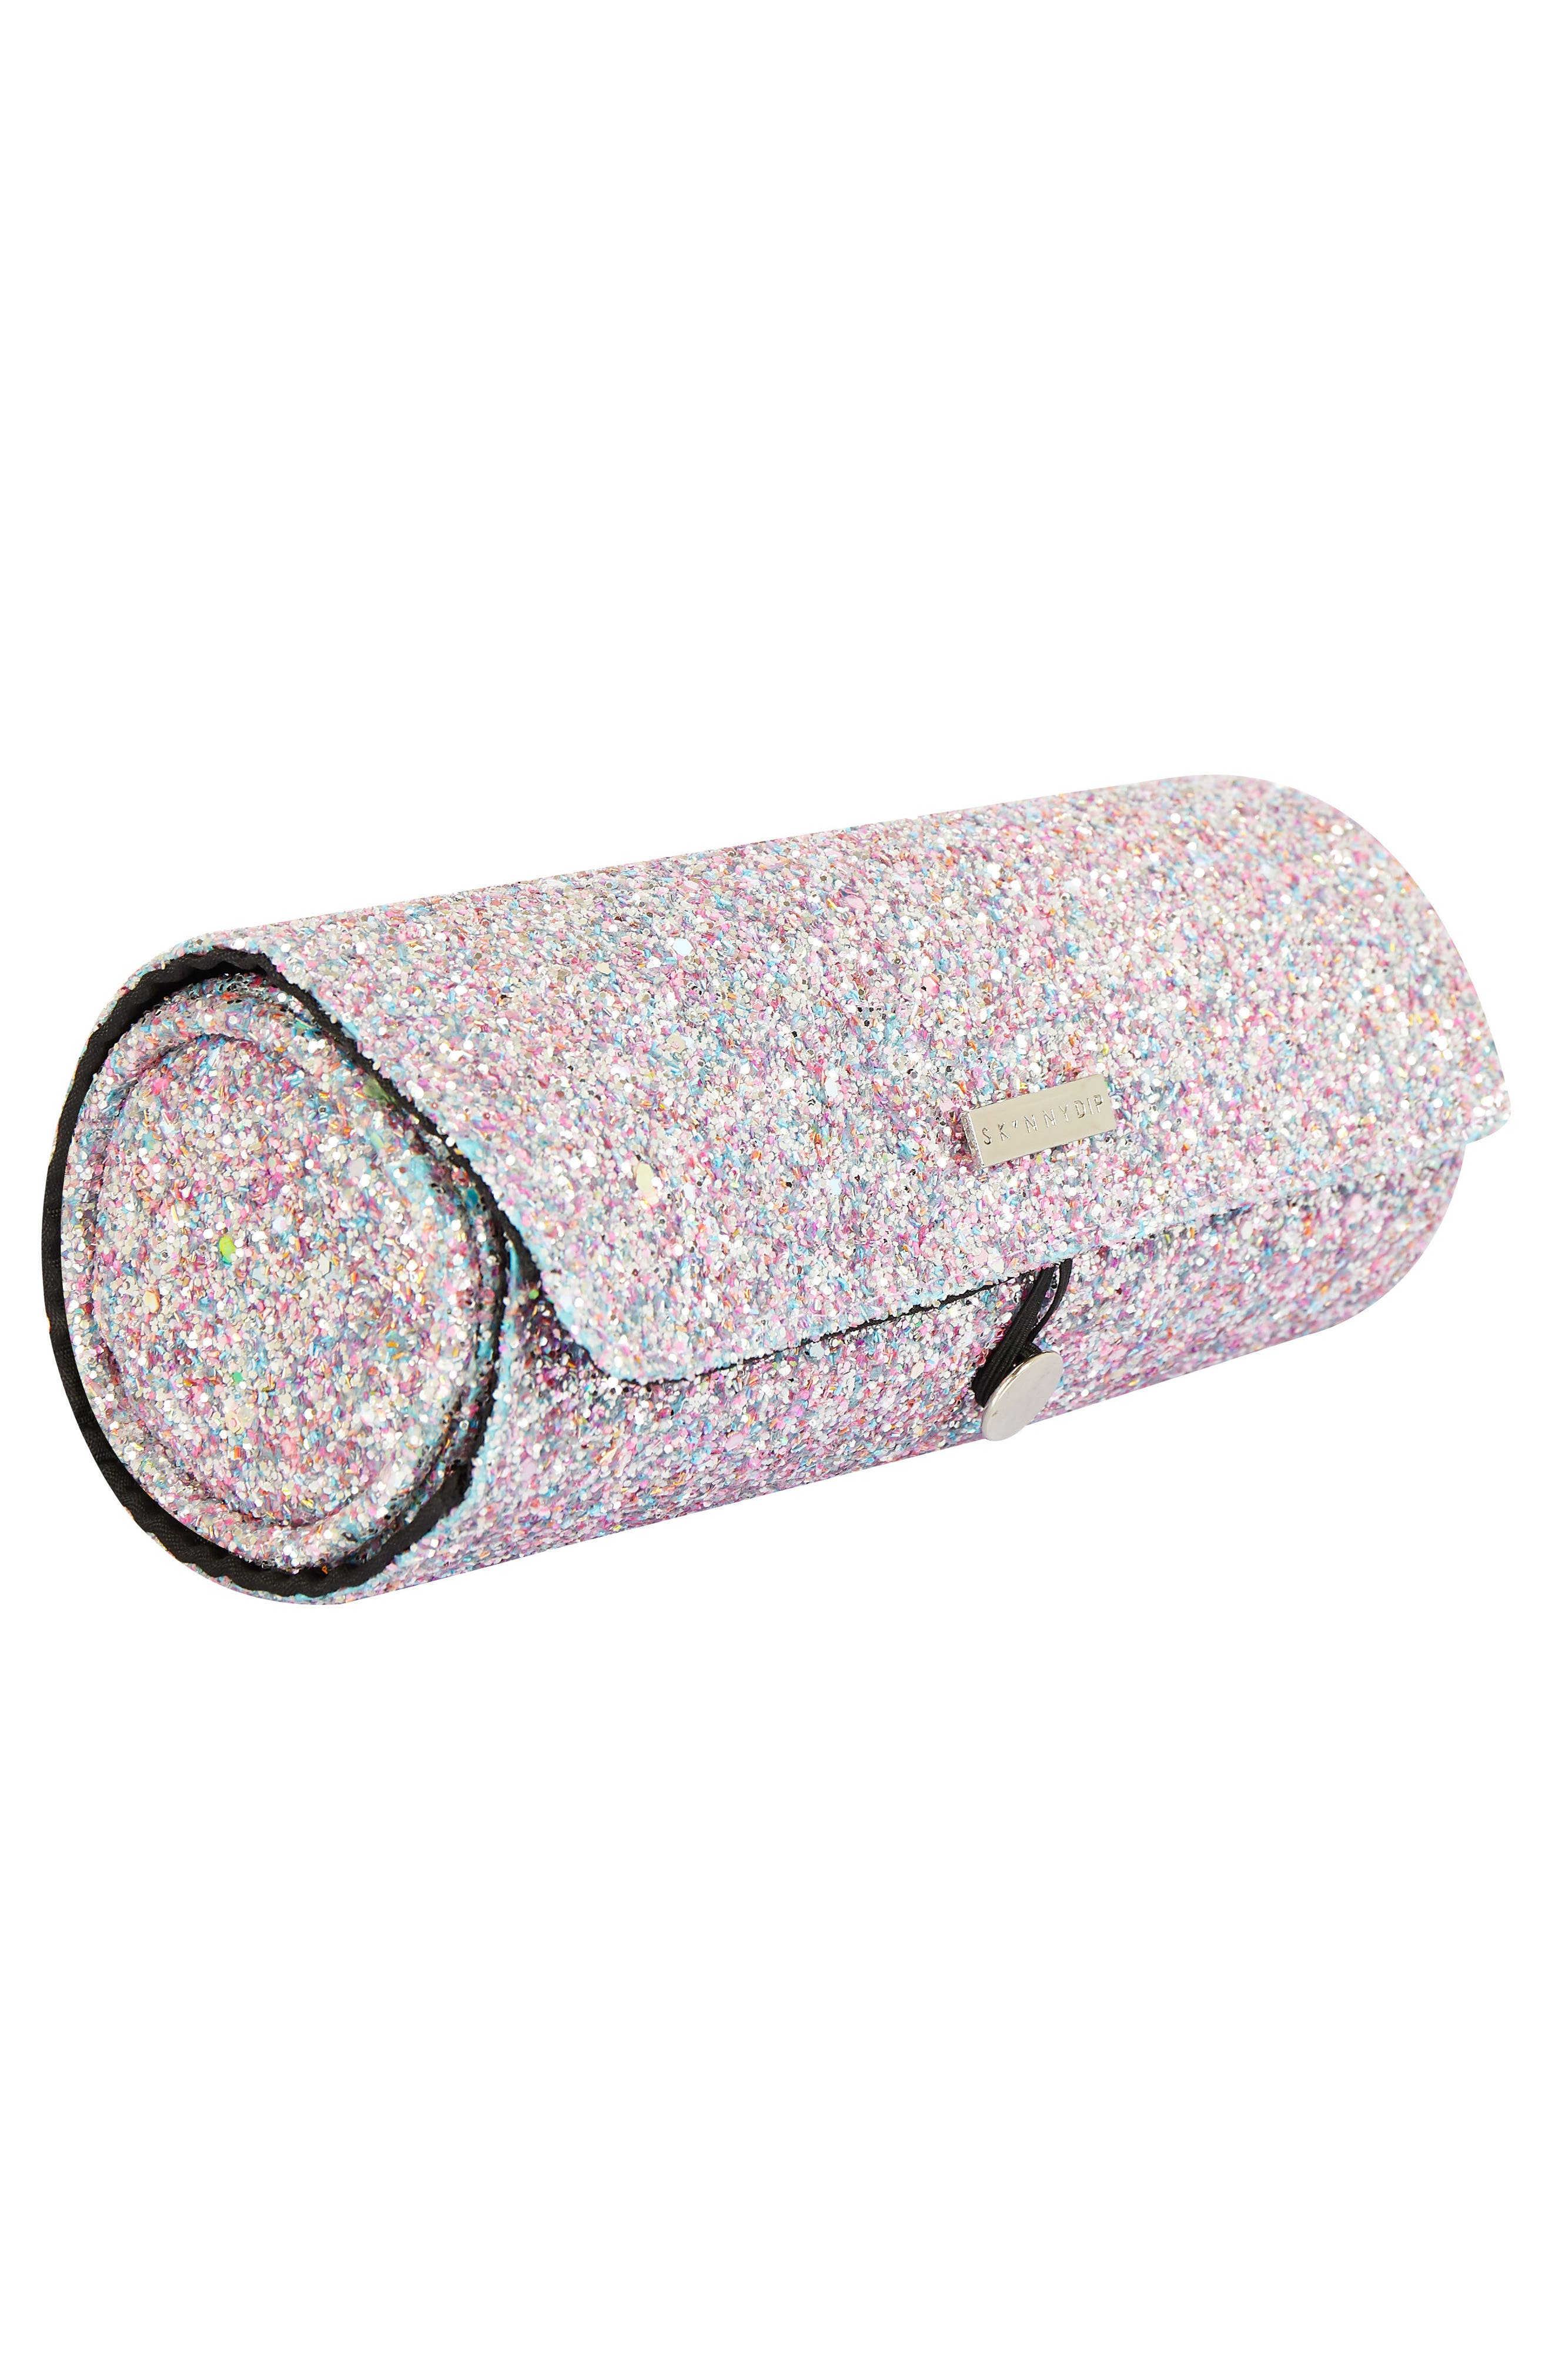 Skinny Dip Treasure Glitter Cosmetics Roll Bag,                             Alternate thumbnail 2, color,                             000